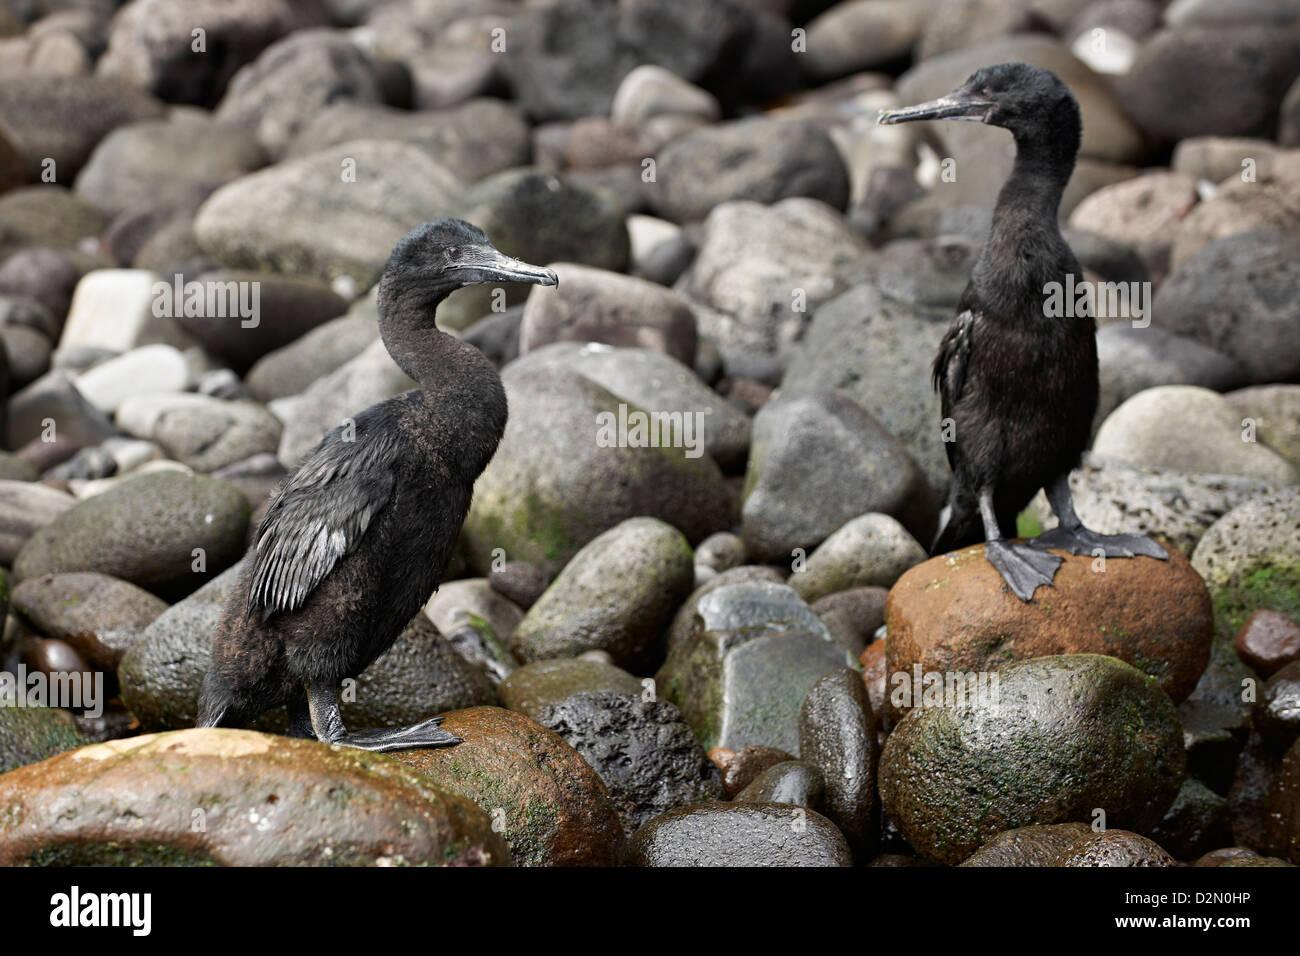 Flightless Cormorant, Phalacrocorax harrisi, Isabela Island, Galapagos Islands, Ecuador - Stock Image